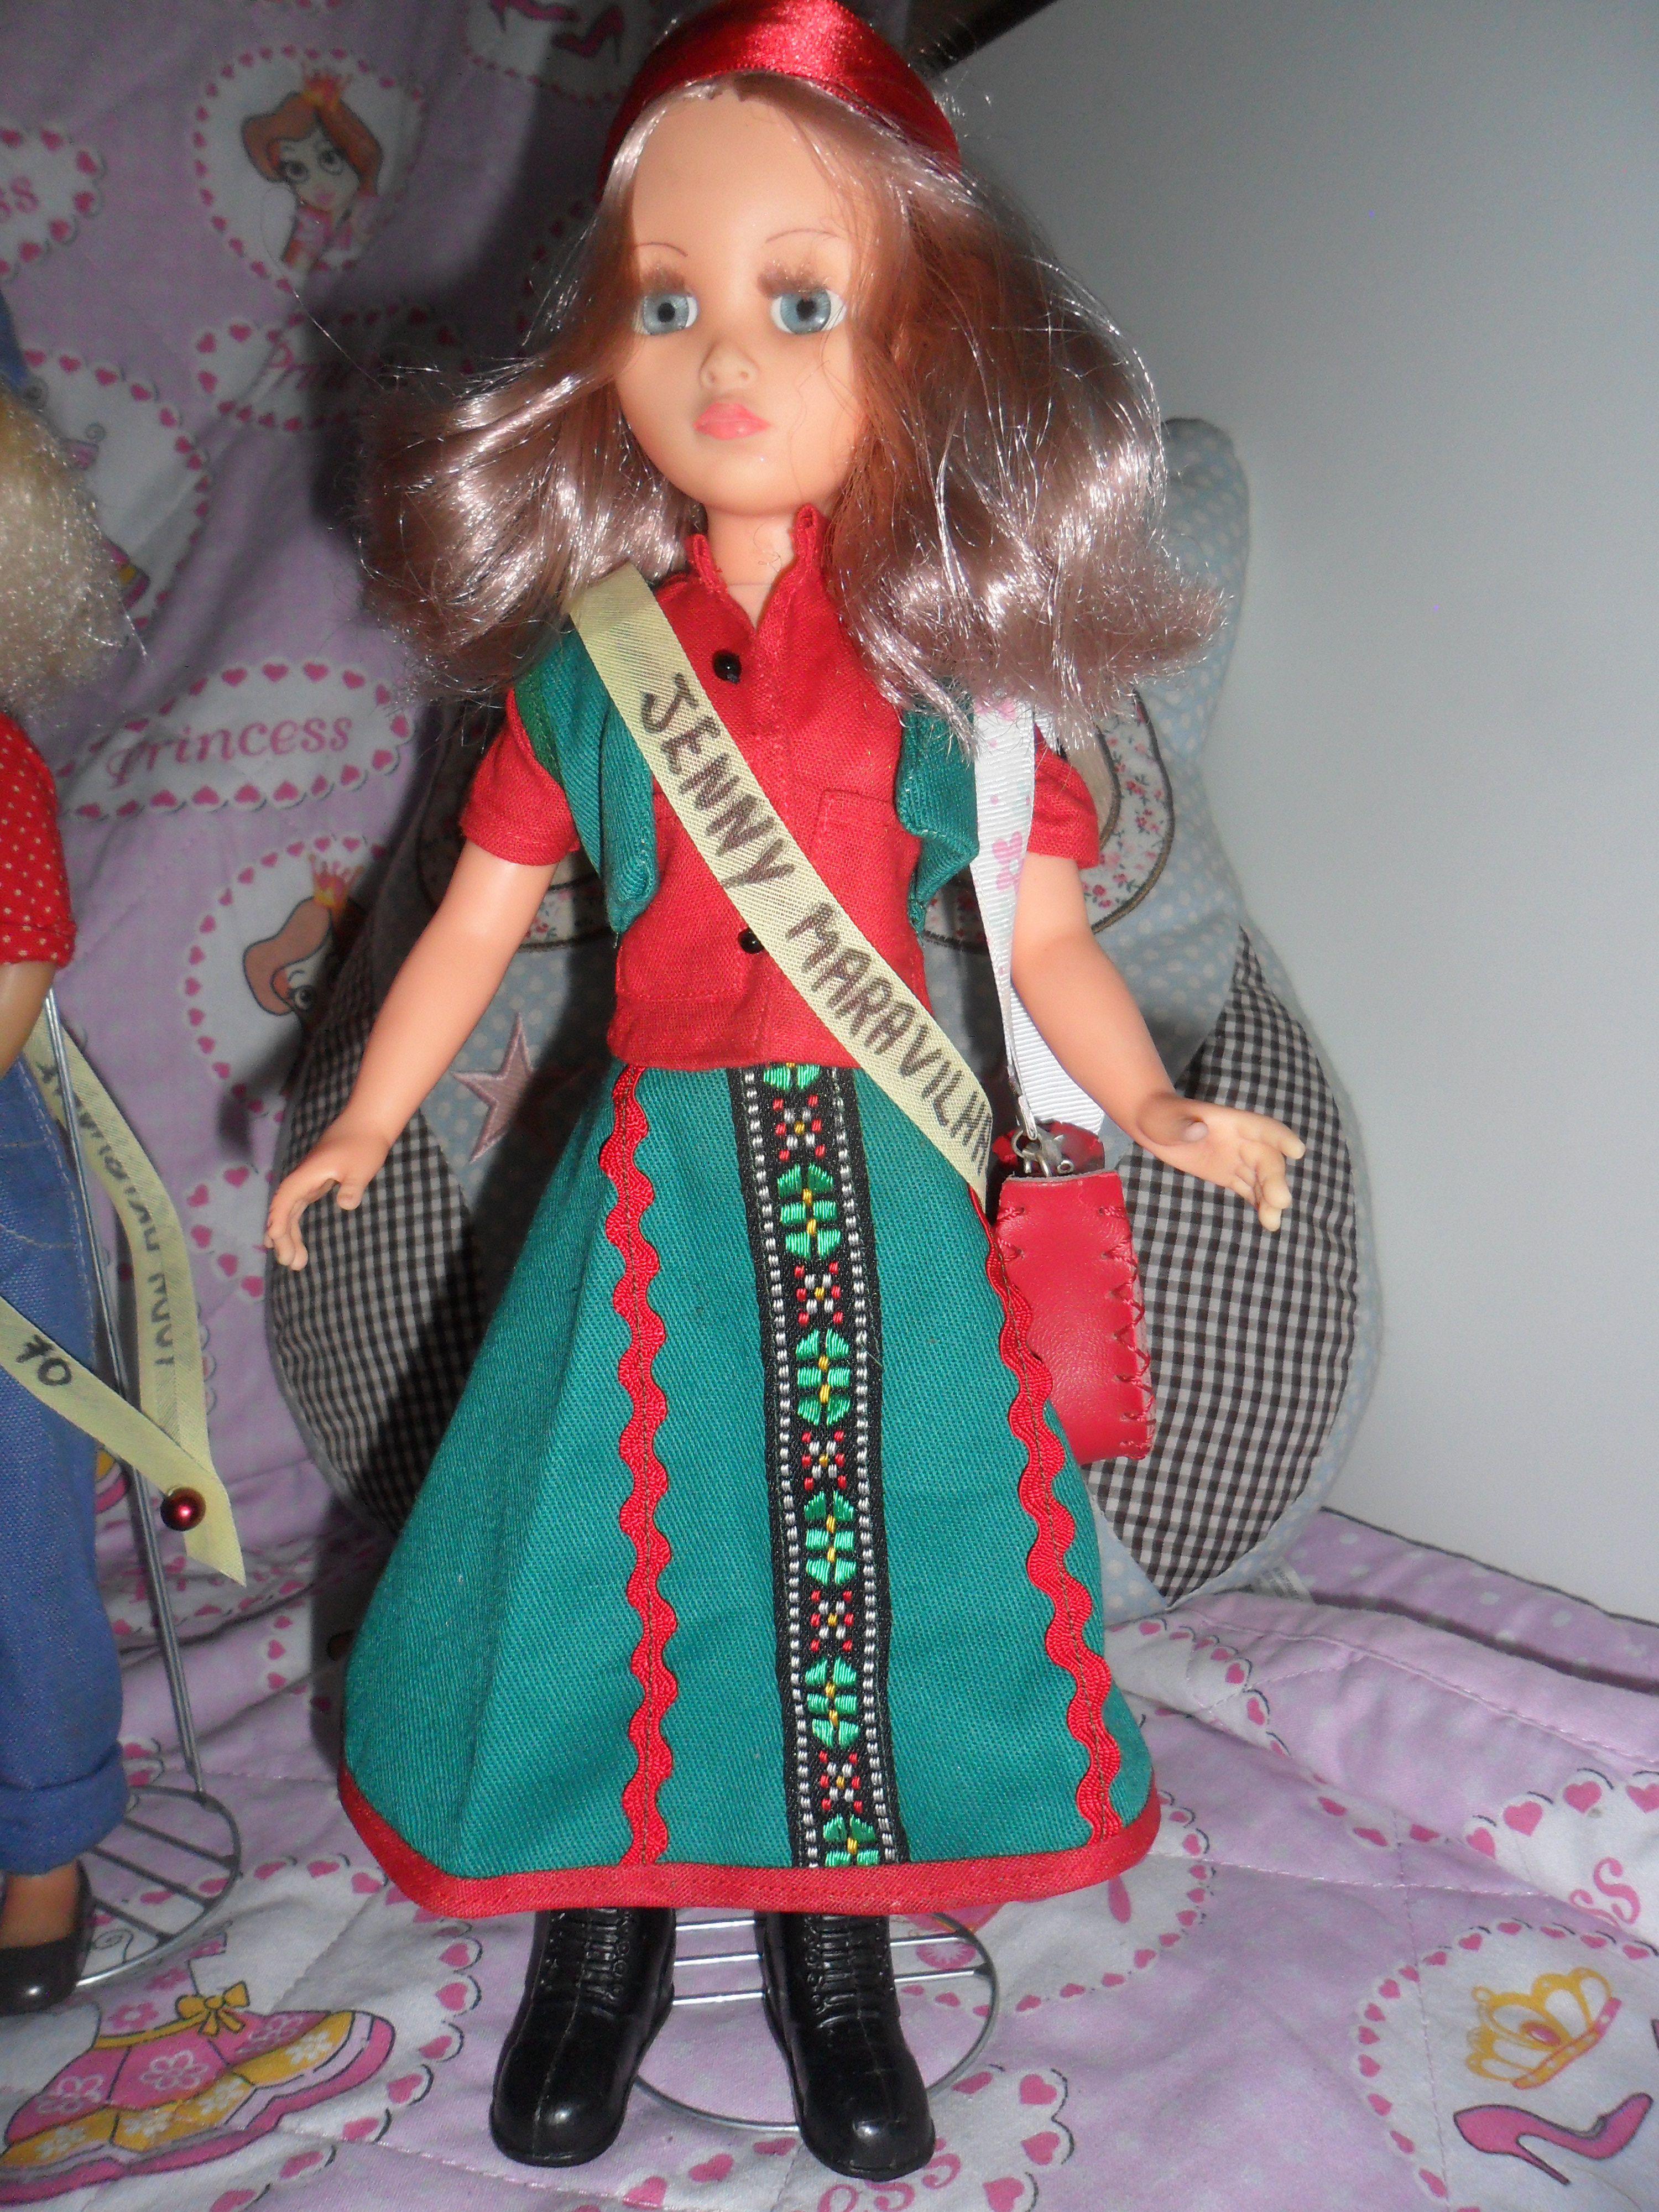 BONECA JENNY MARAVILHA - CUSTOMIZADA - DA ATMA. ANOS 70